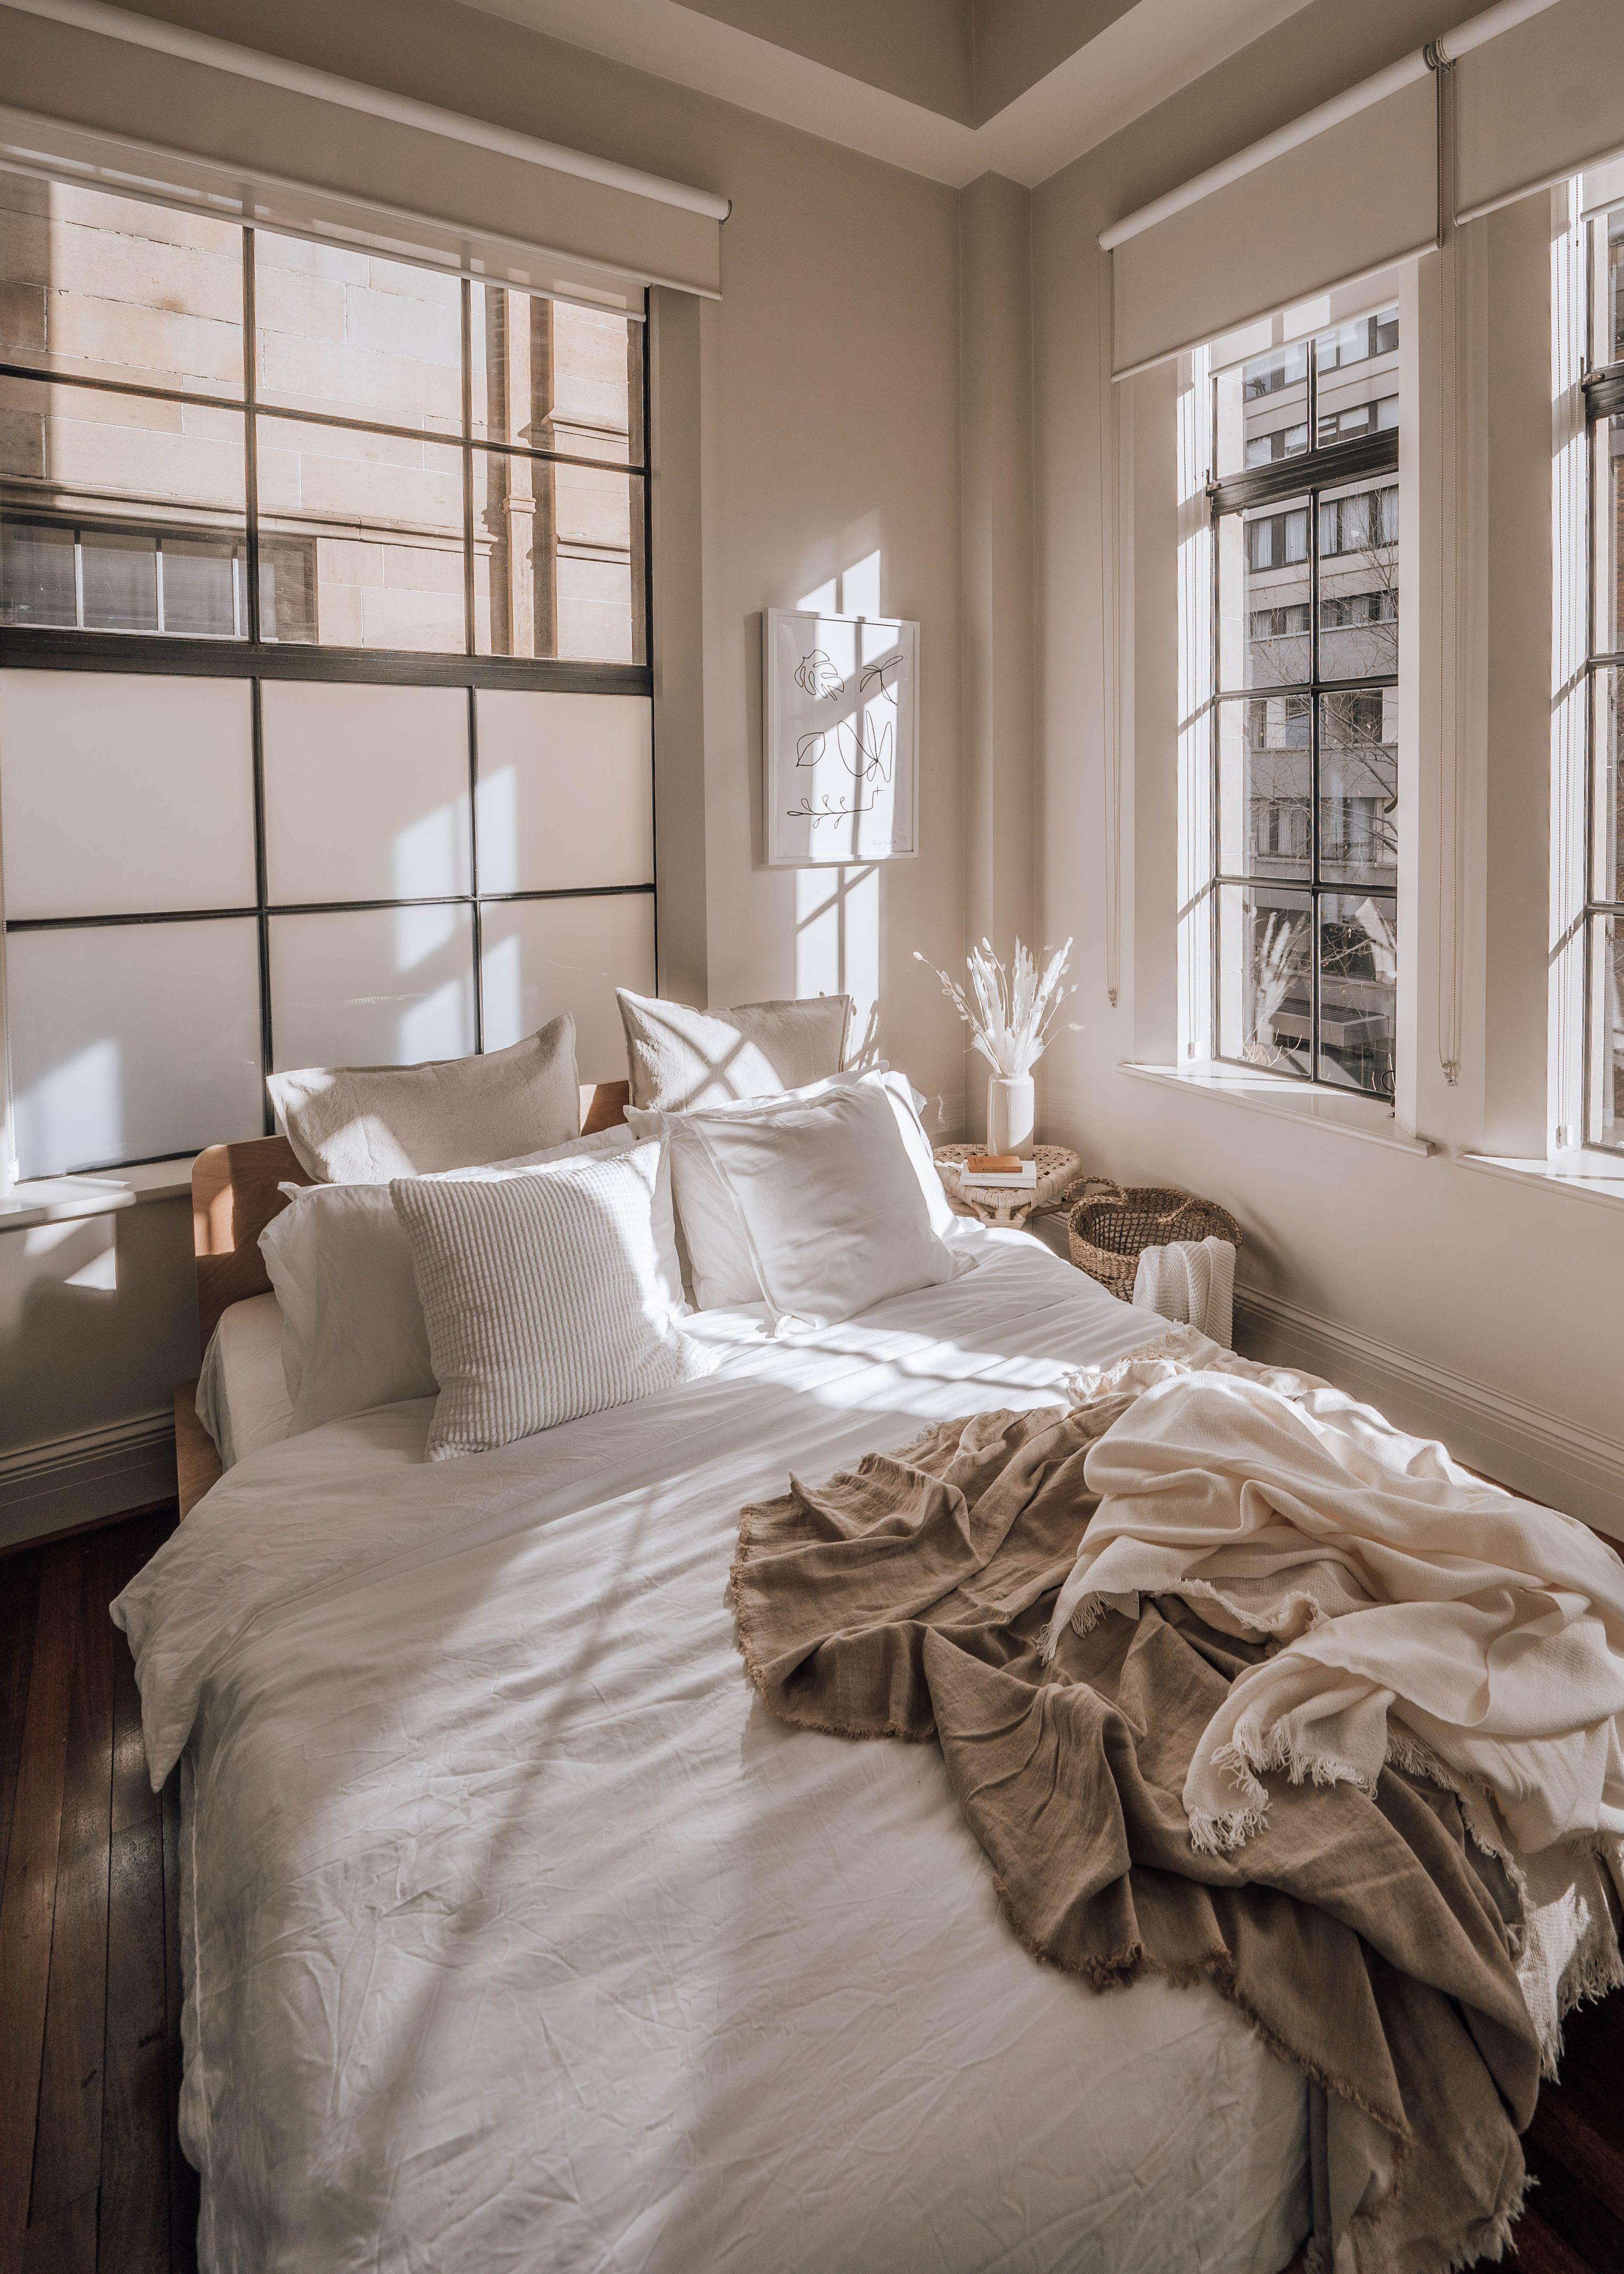 Upgrade your bedroom with our awardwinning koala mattress